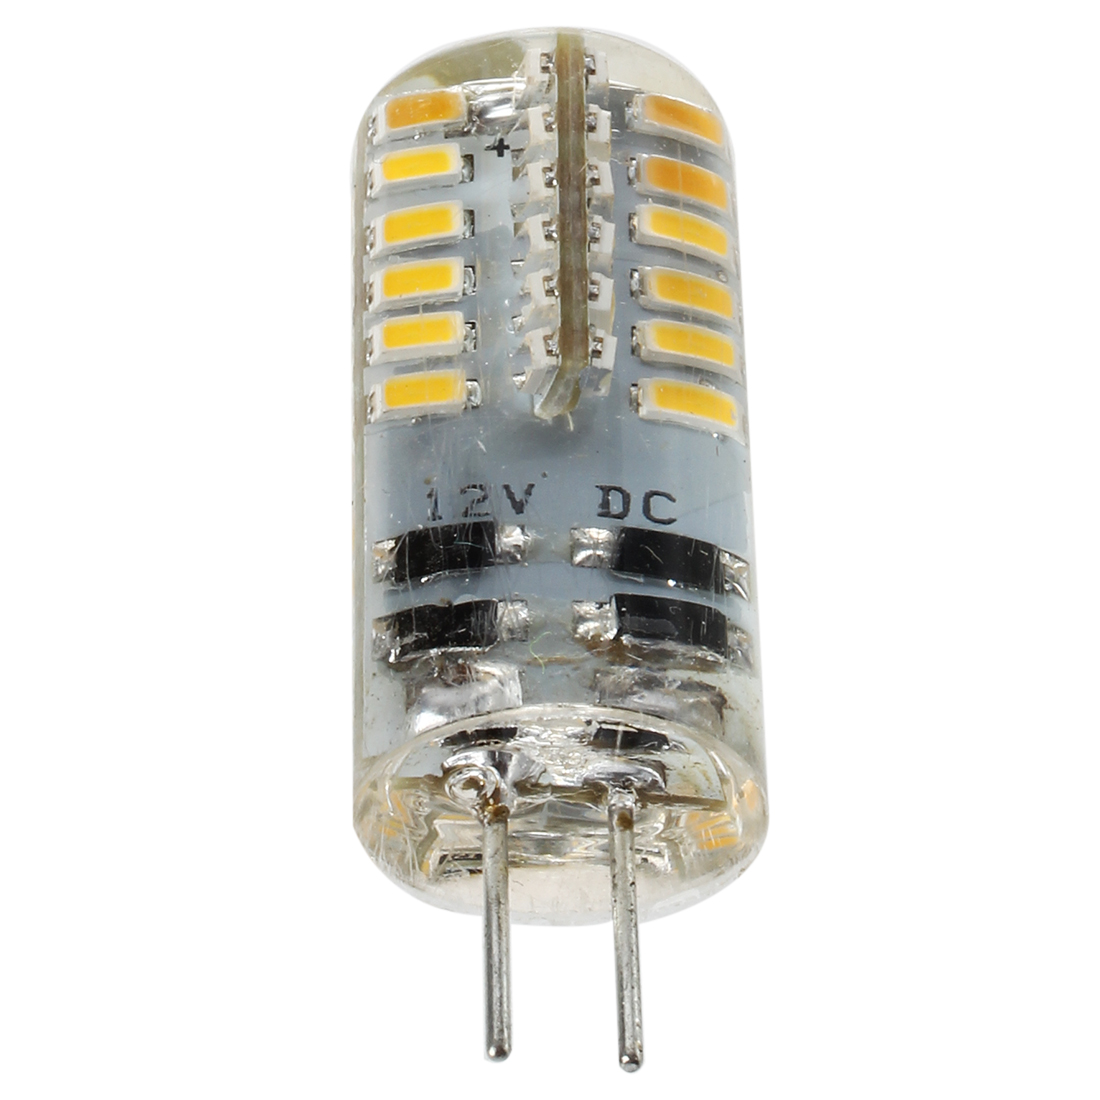 2W G4 48 3014 SMD LED Lamp AC / DC12V Warm White Light For Home-use